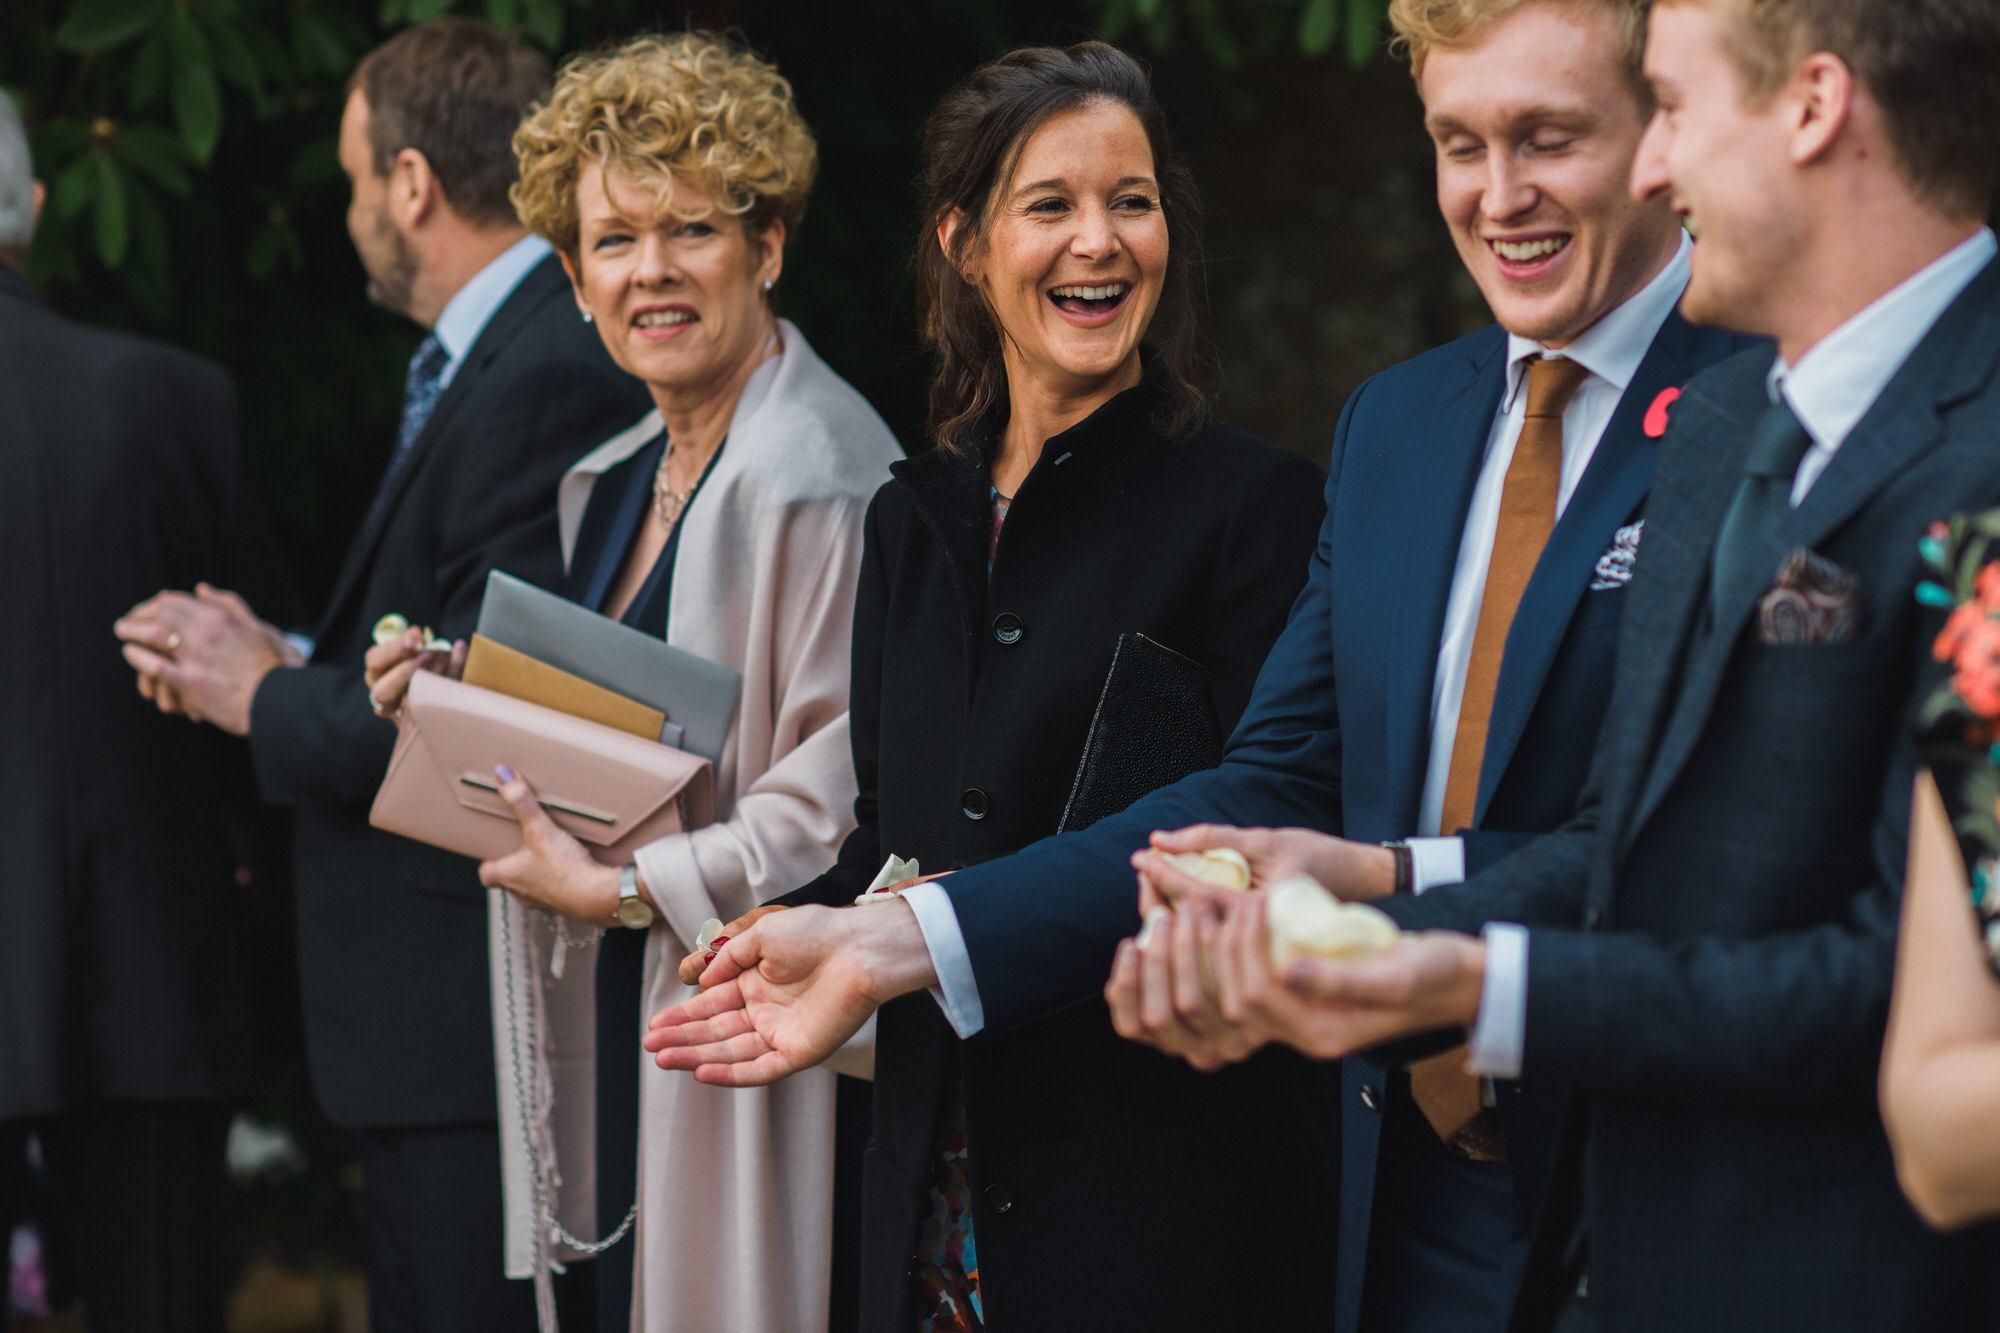 Brympton House wedding ceremony by simon biffen photography 23